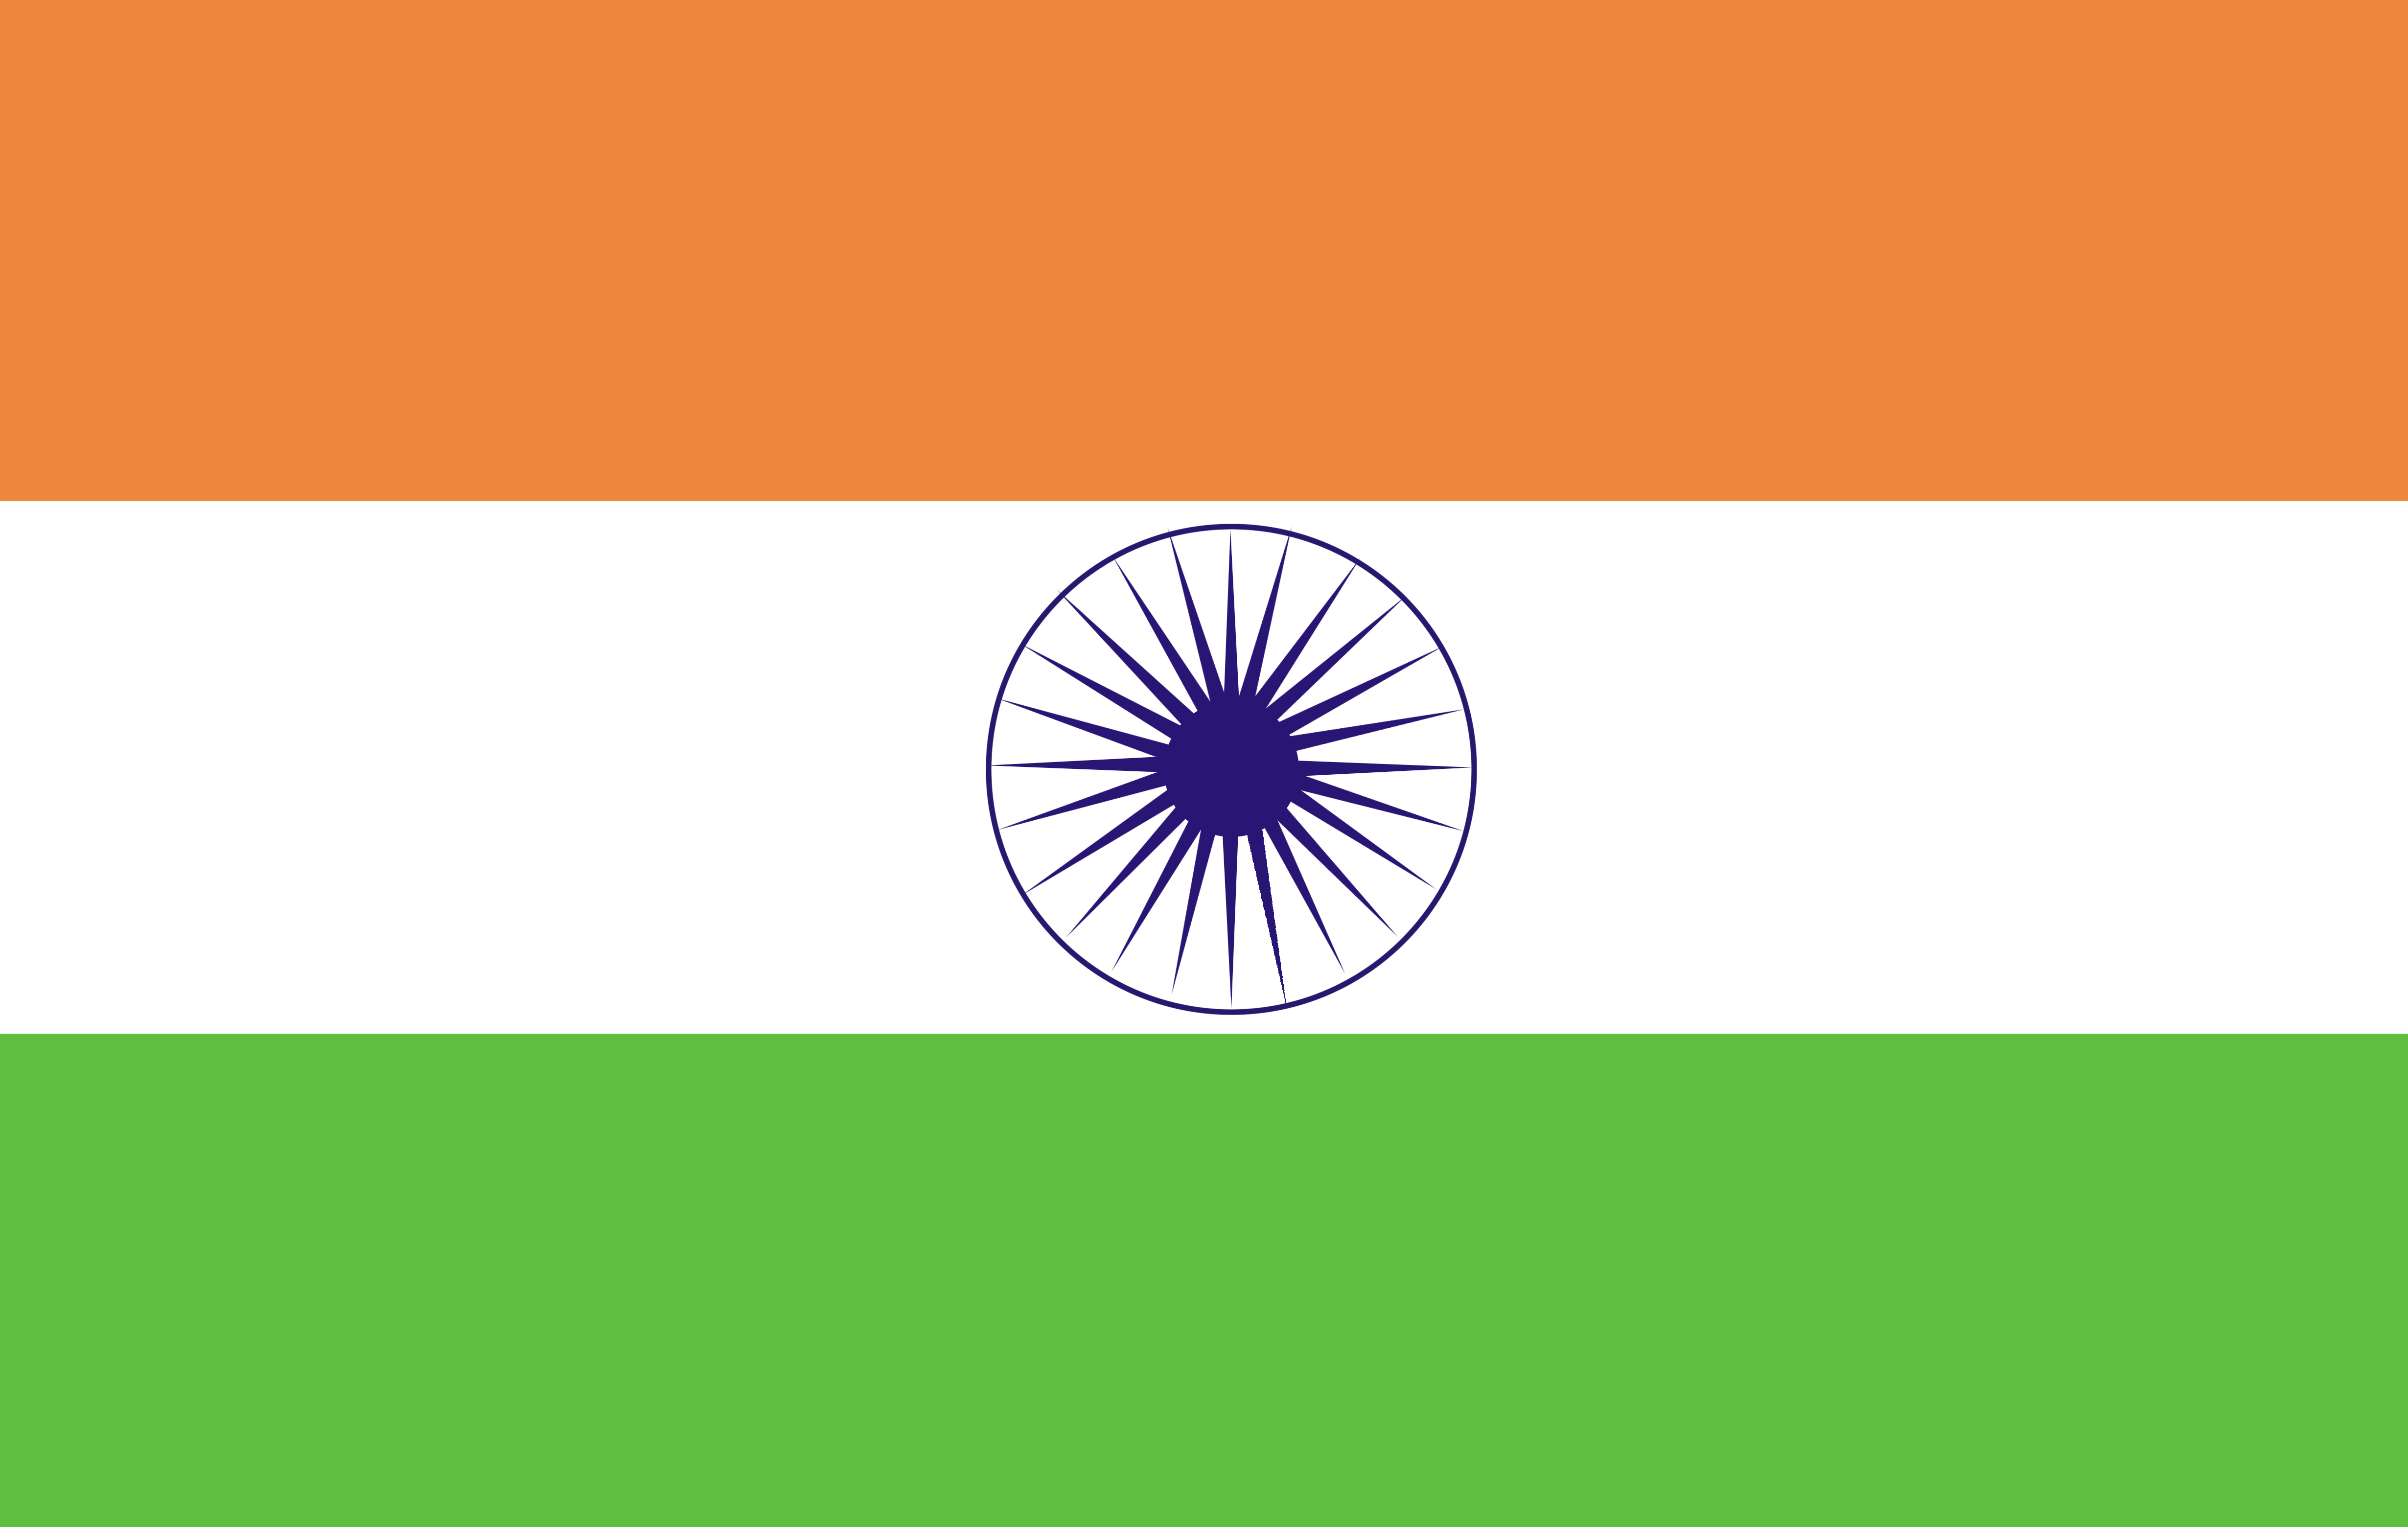 flag india indian hd wallpapers national flags independence symbol happywalagift granite mobile hindi symbols countries proud 4k desktop dictatorships benevolent